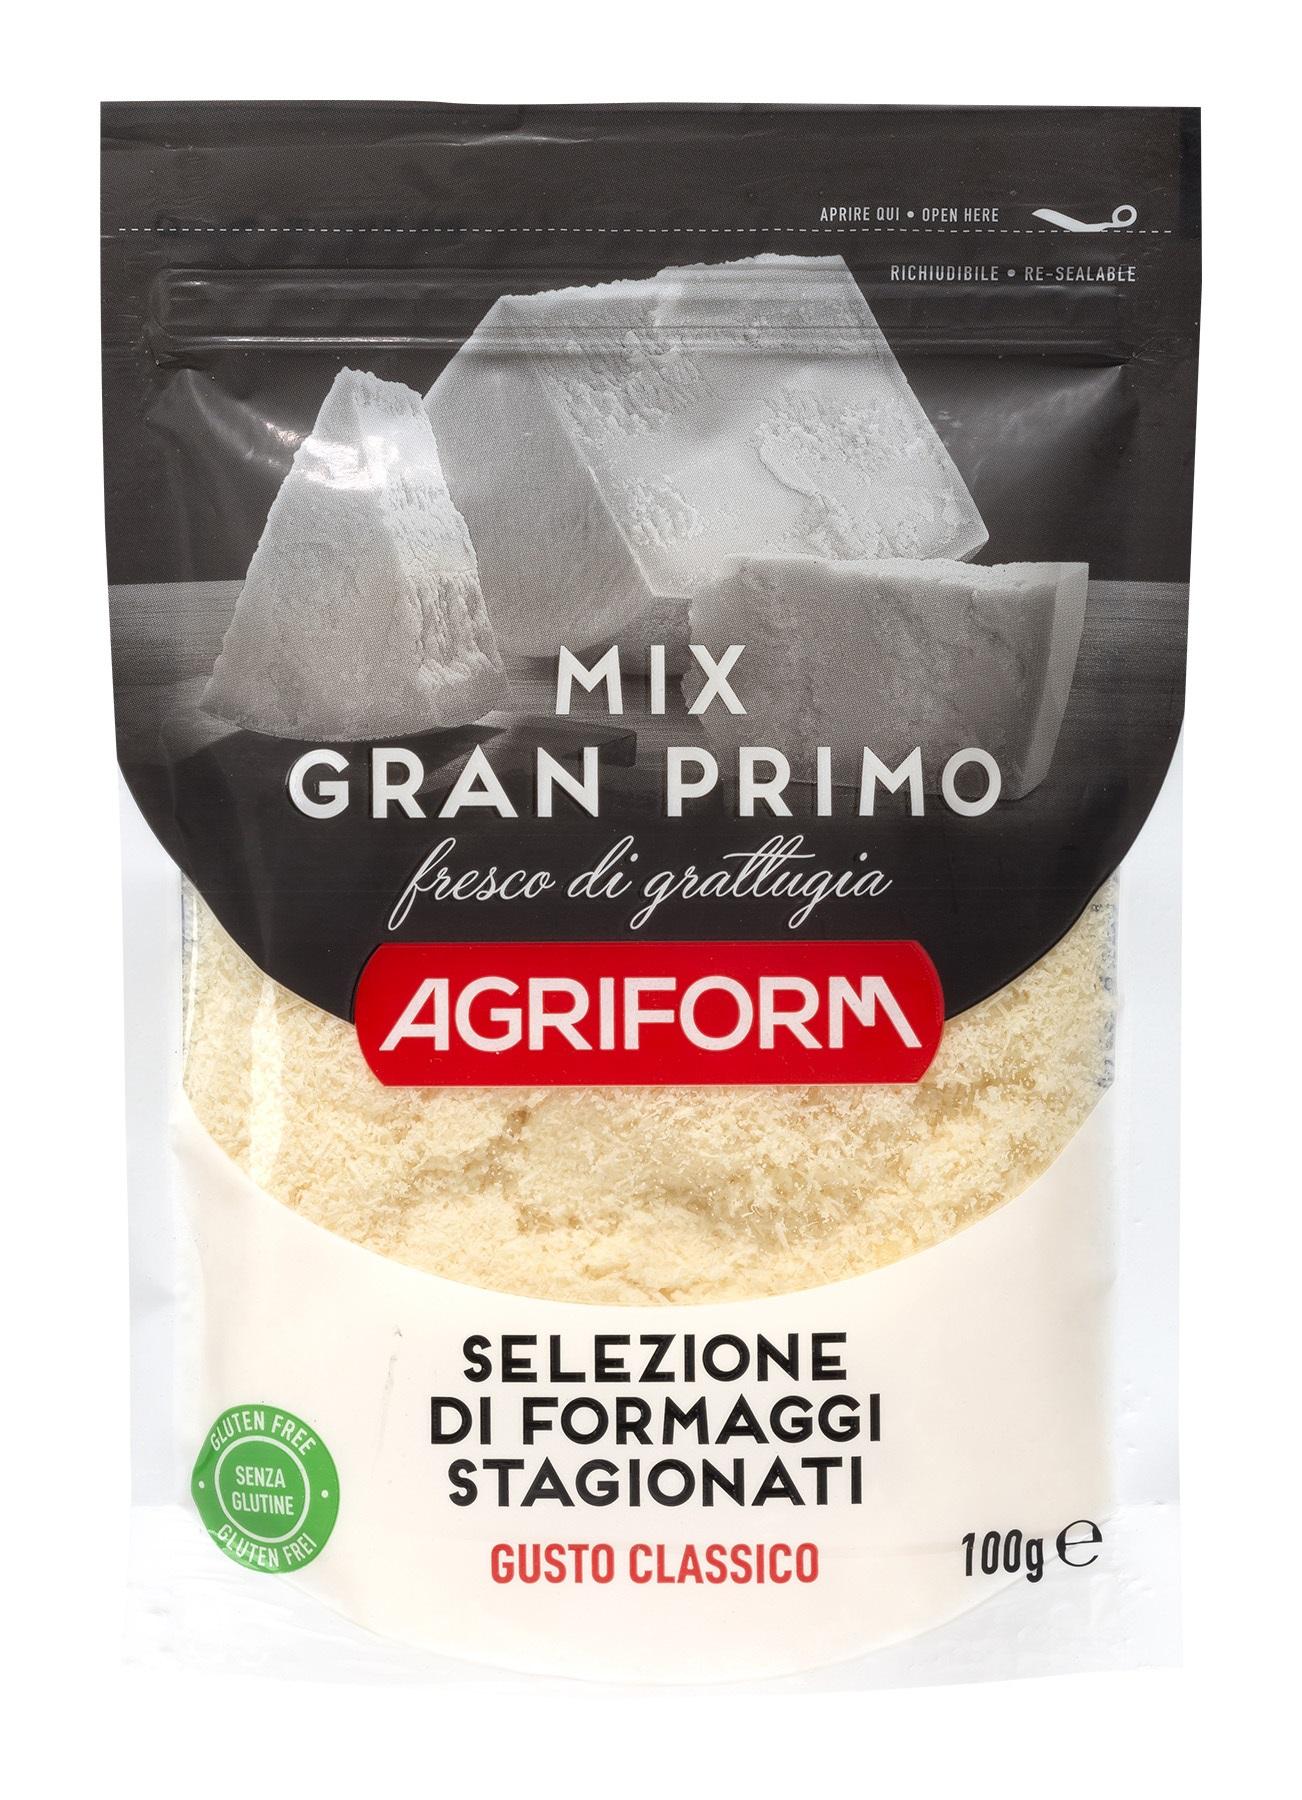 GRAN PRIMO Mix reszelt sajt 100g